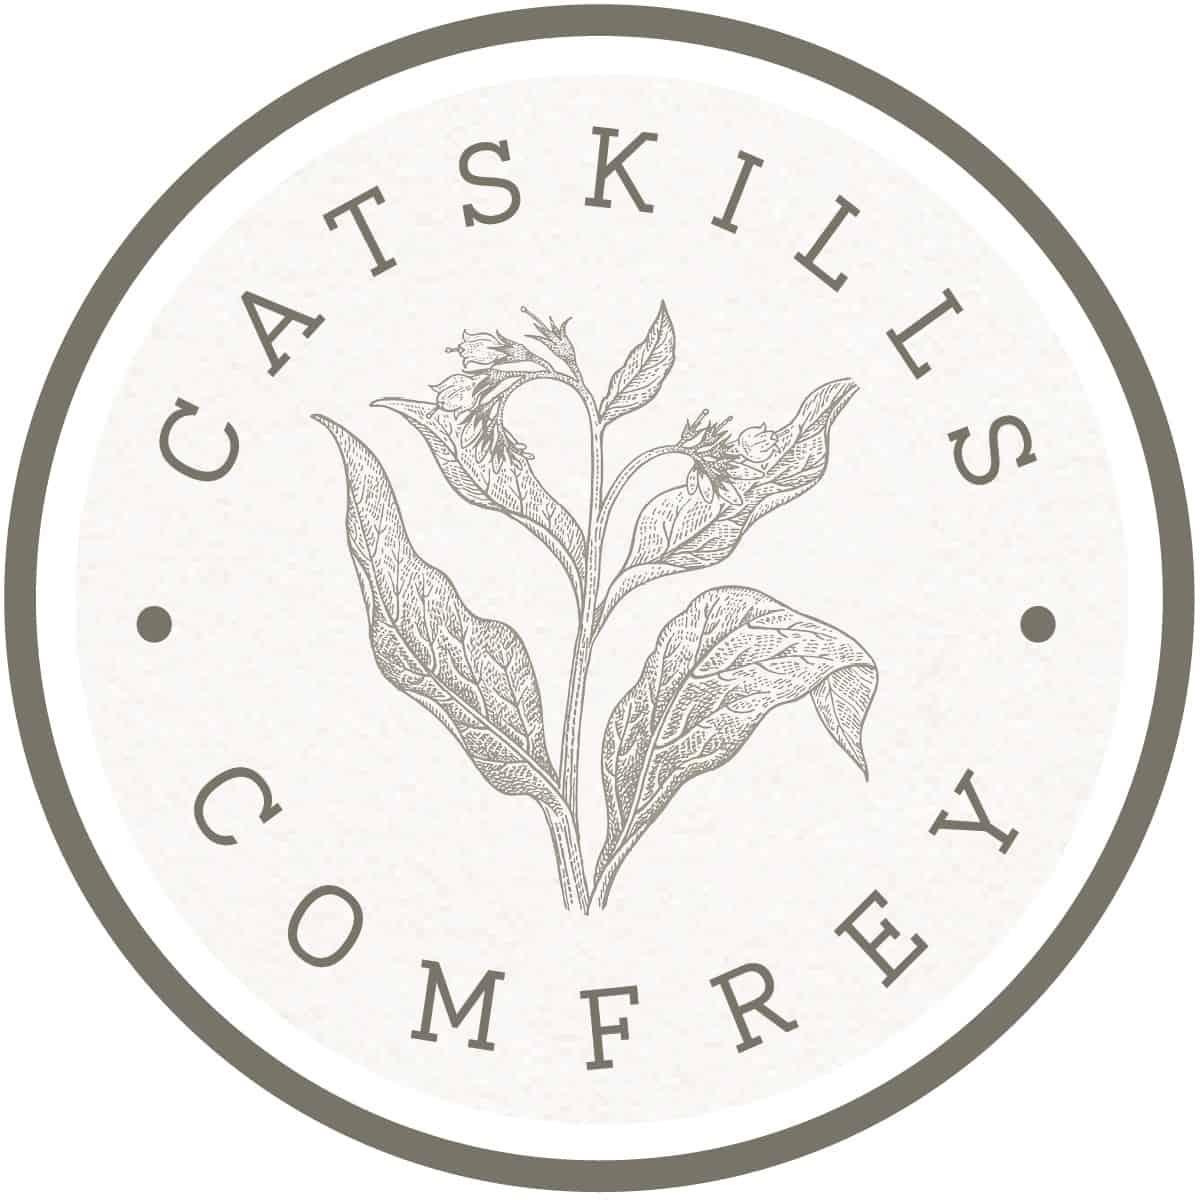 Catskills Comfrey